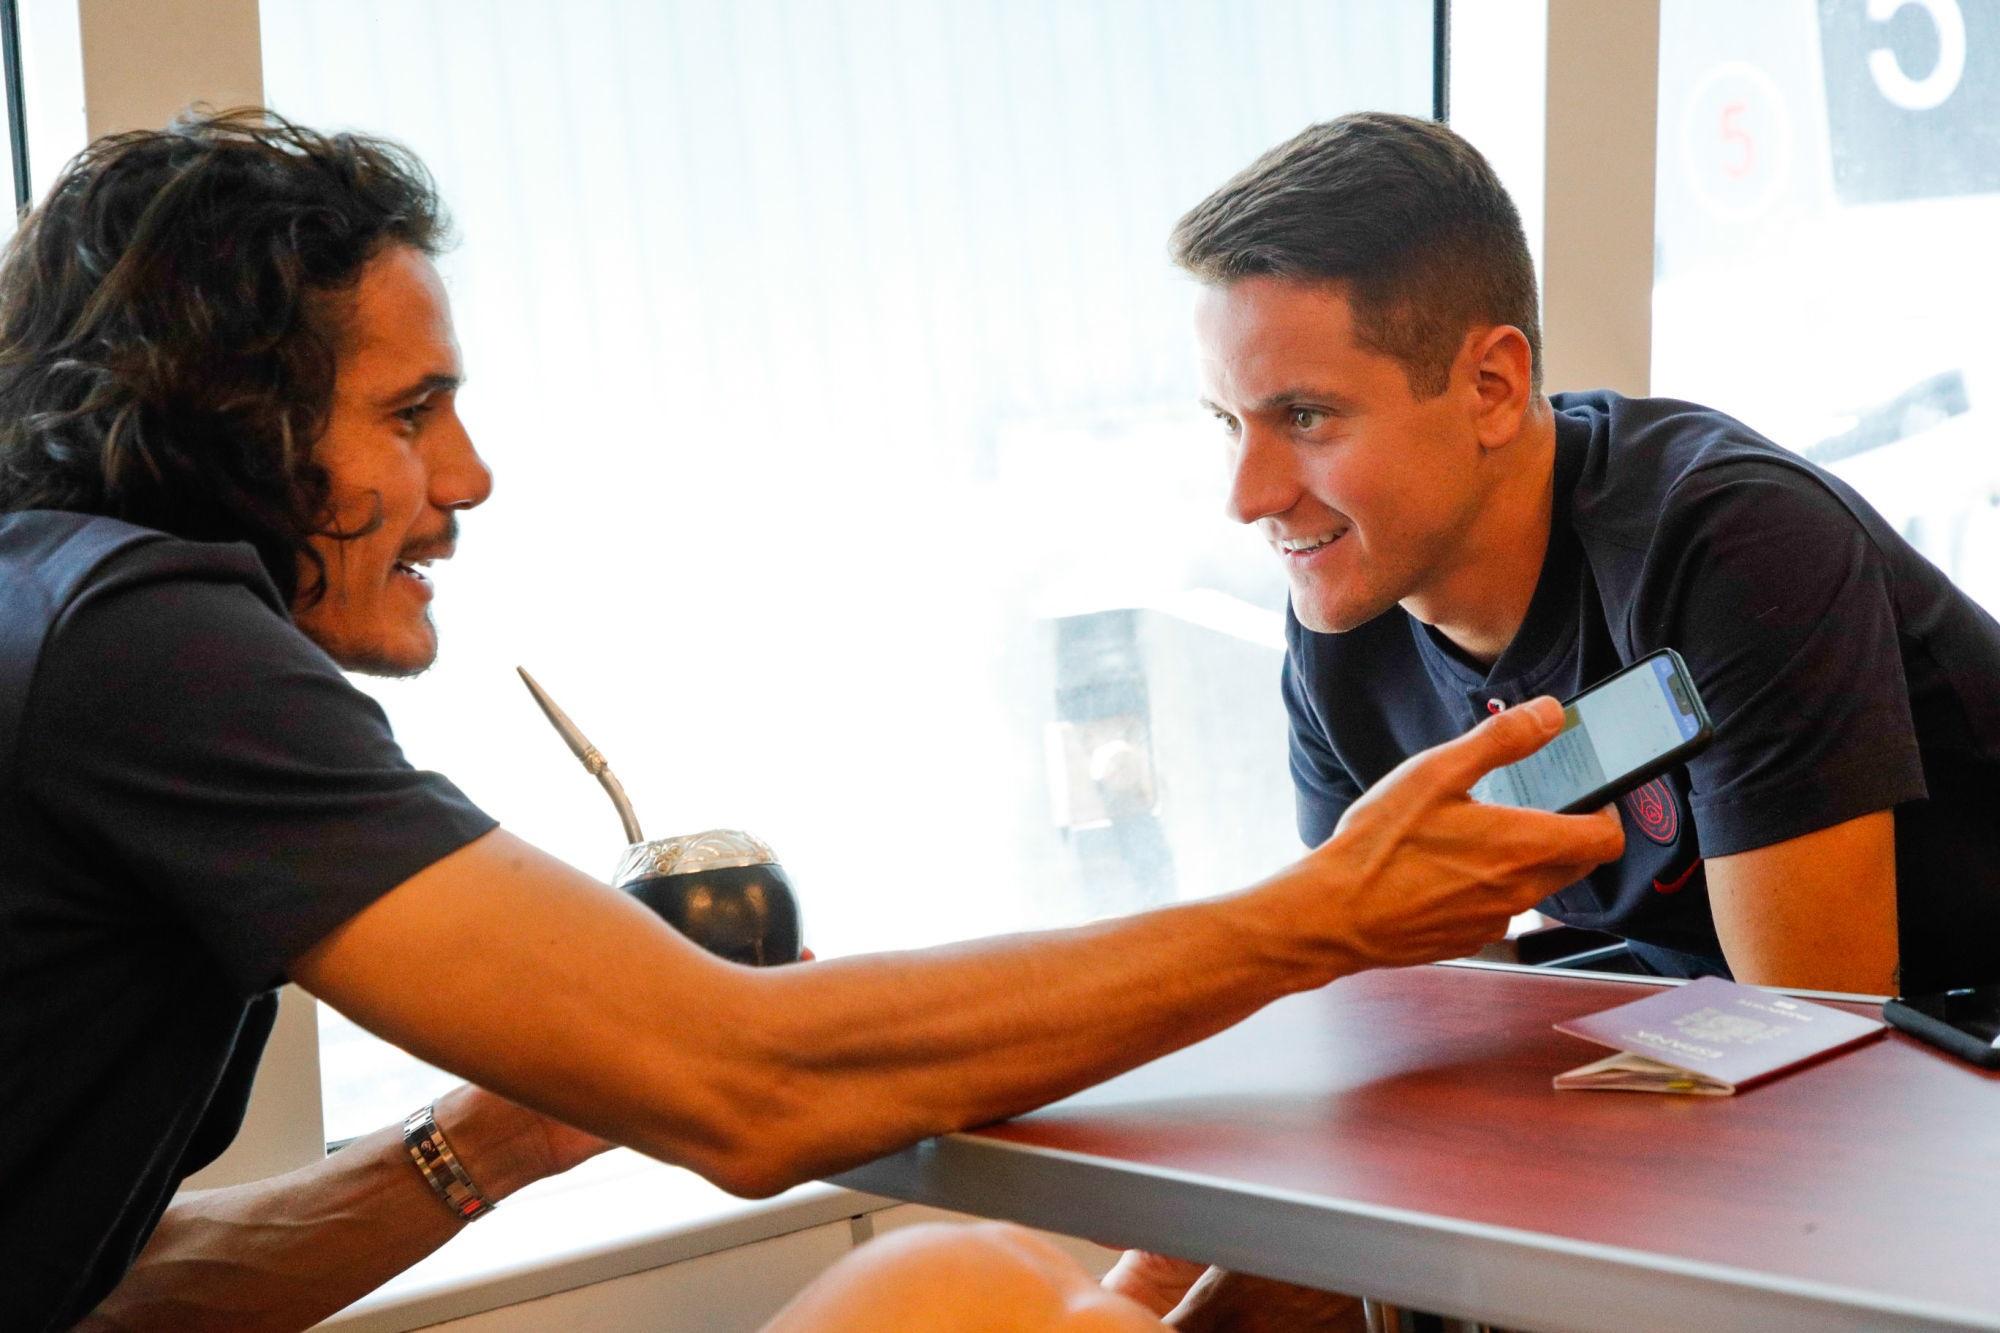 Herrera dévoile sa discussion avec Cavani avant sa signature à Manchester United